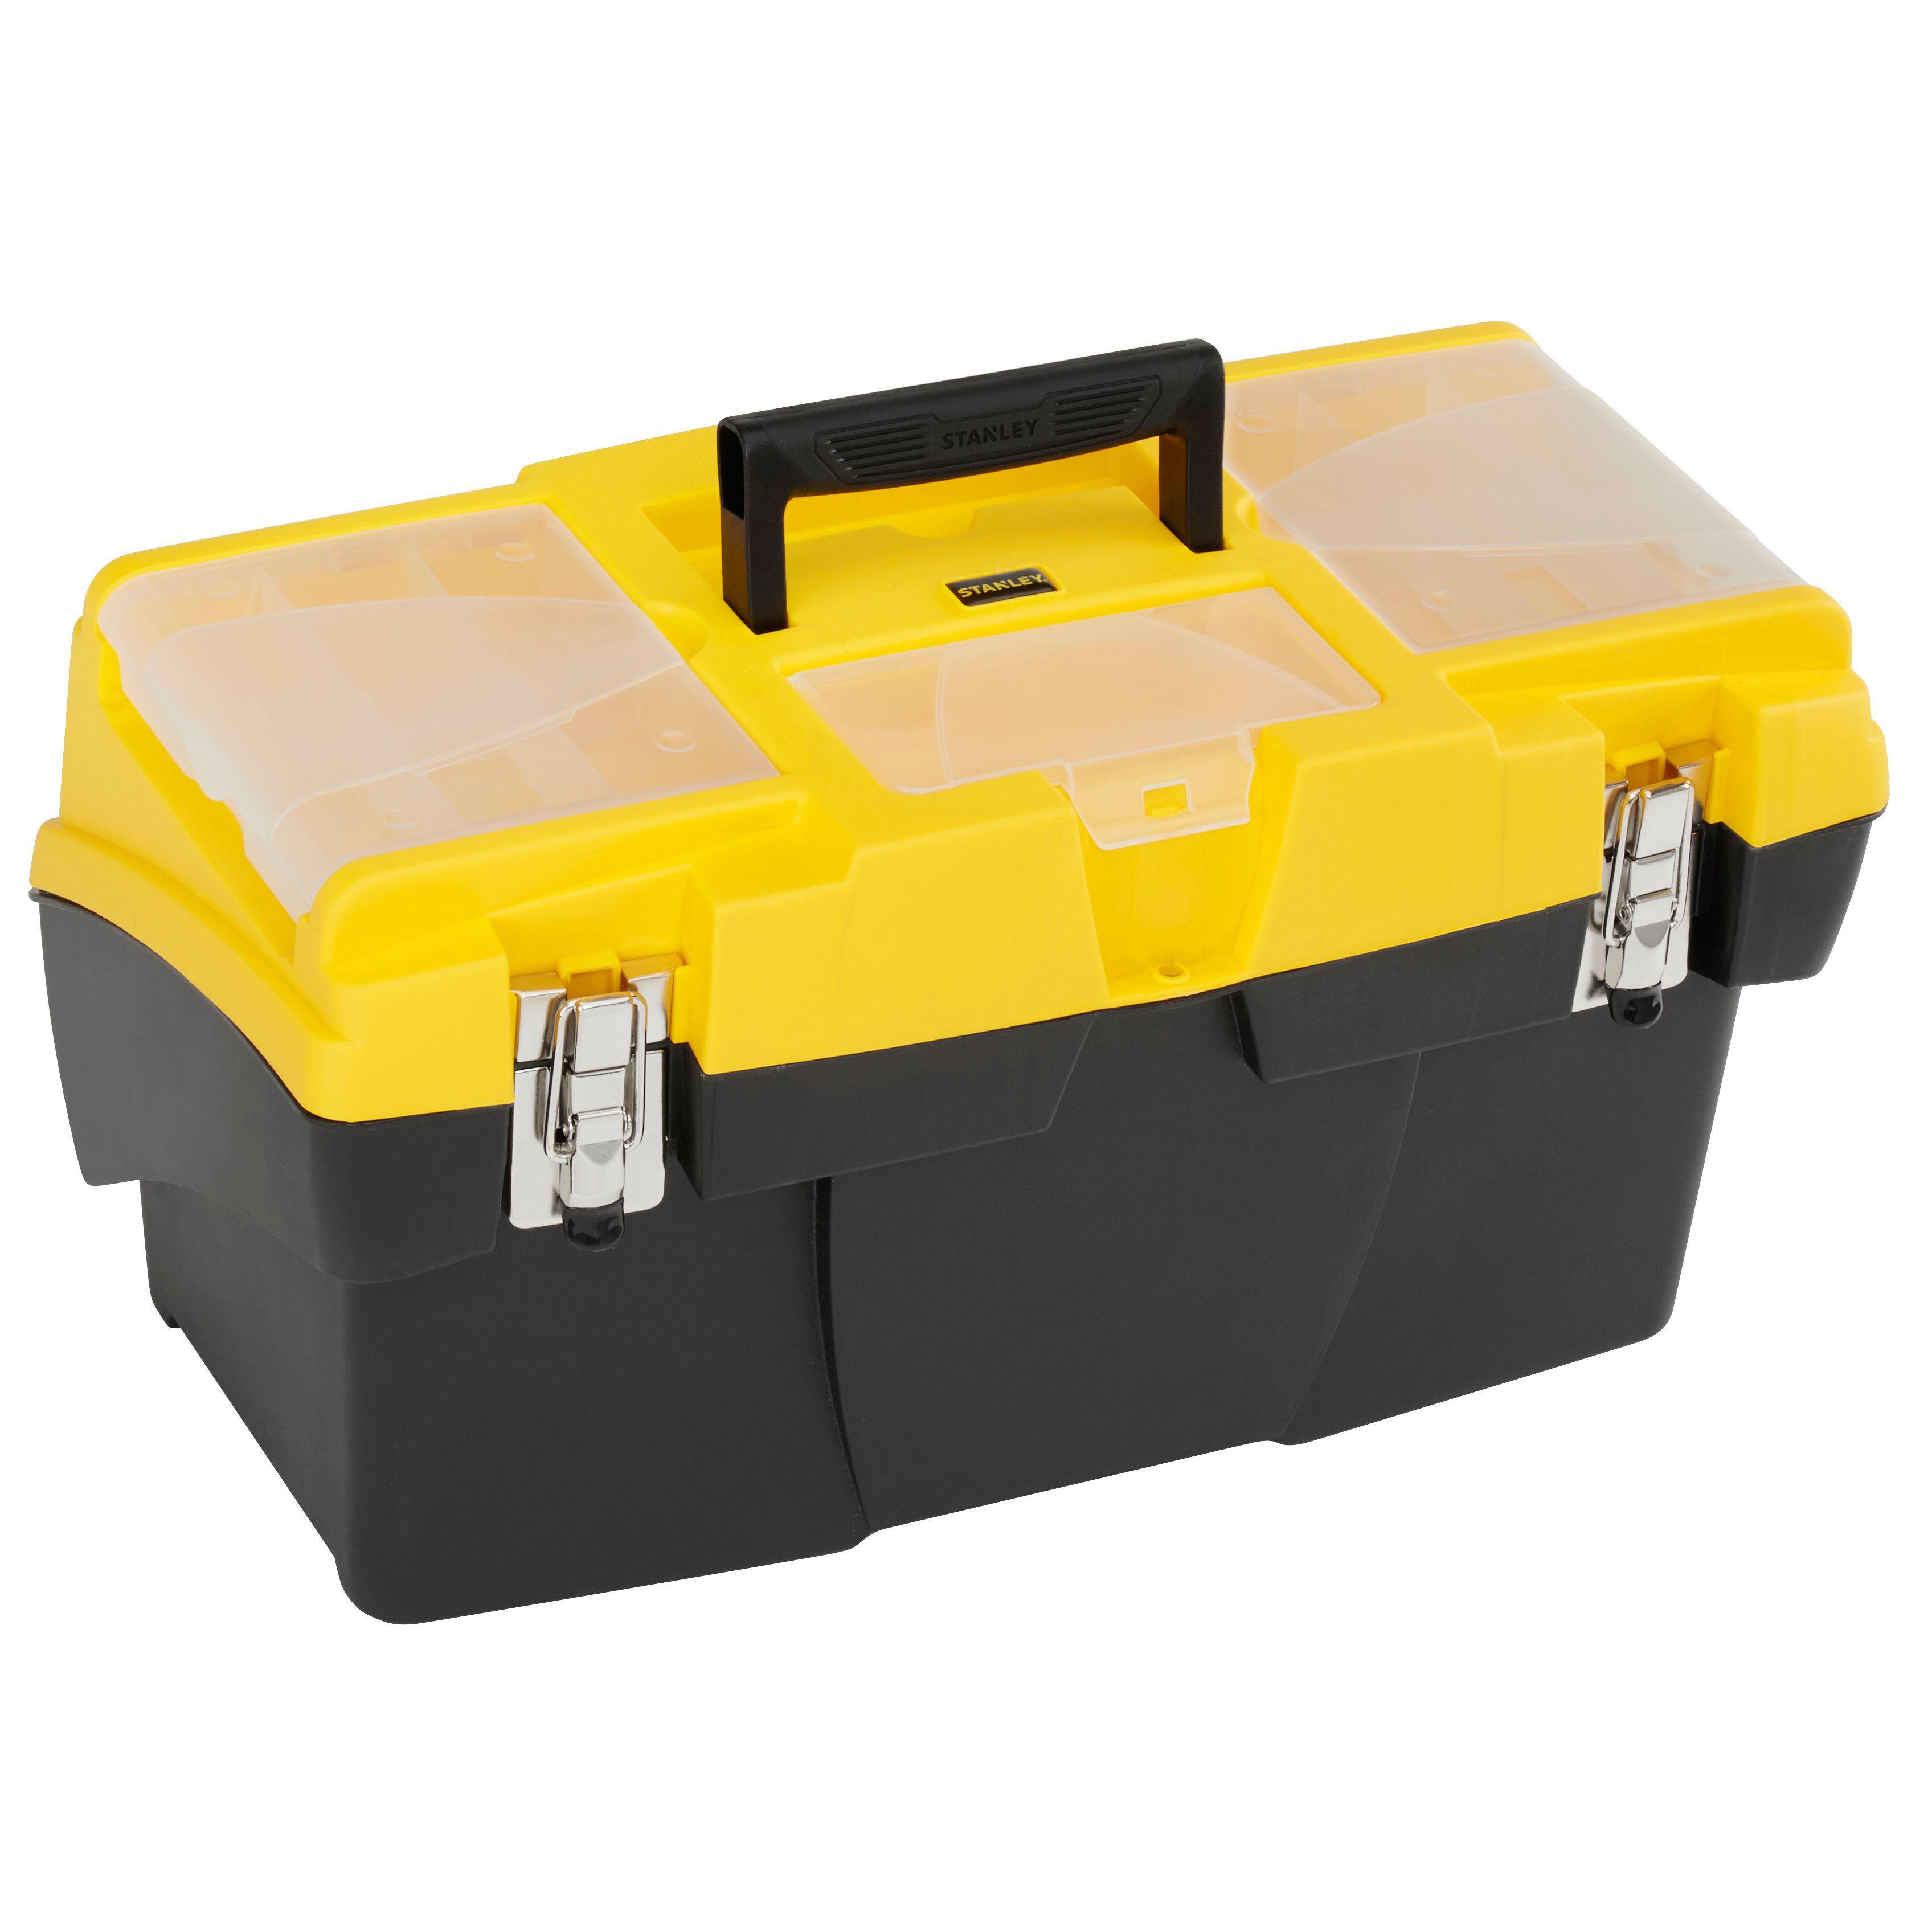 Stanley 19 Quot Cantilever Tool Box Departments Diy At B Amp Q